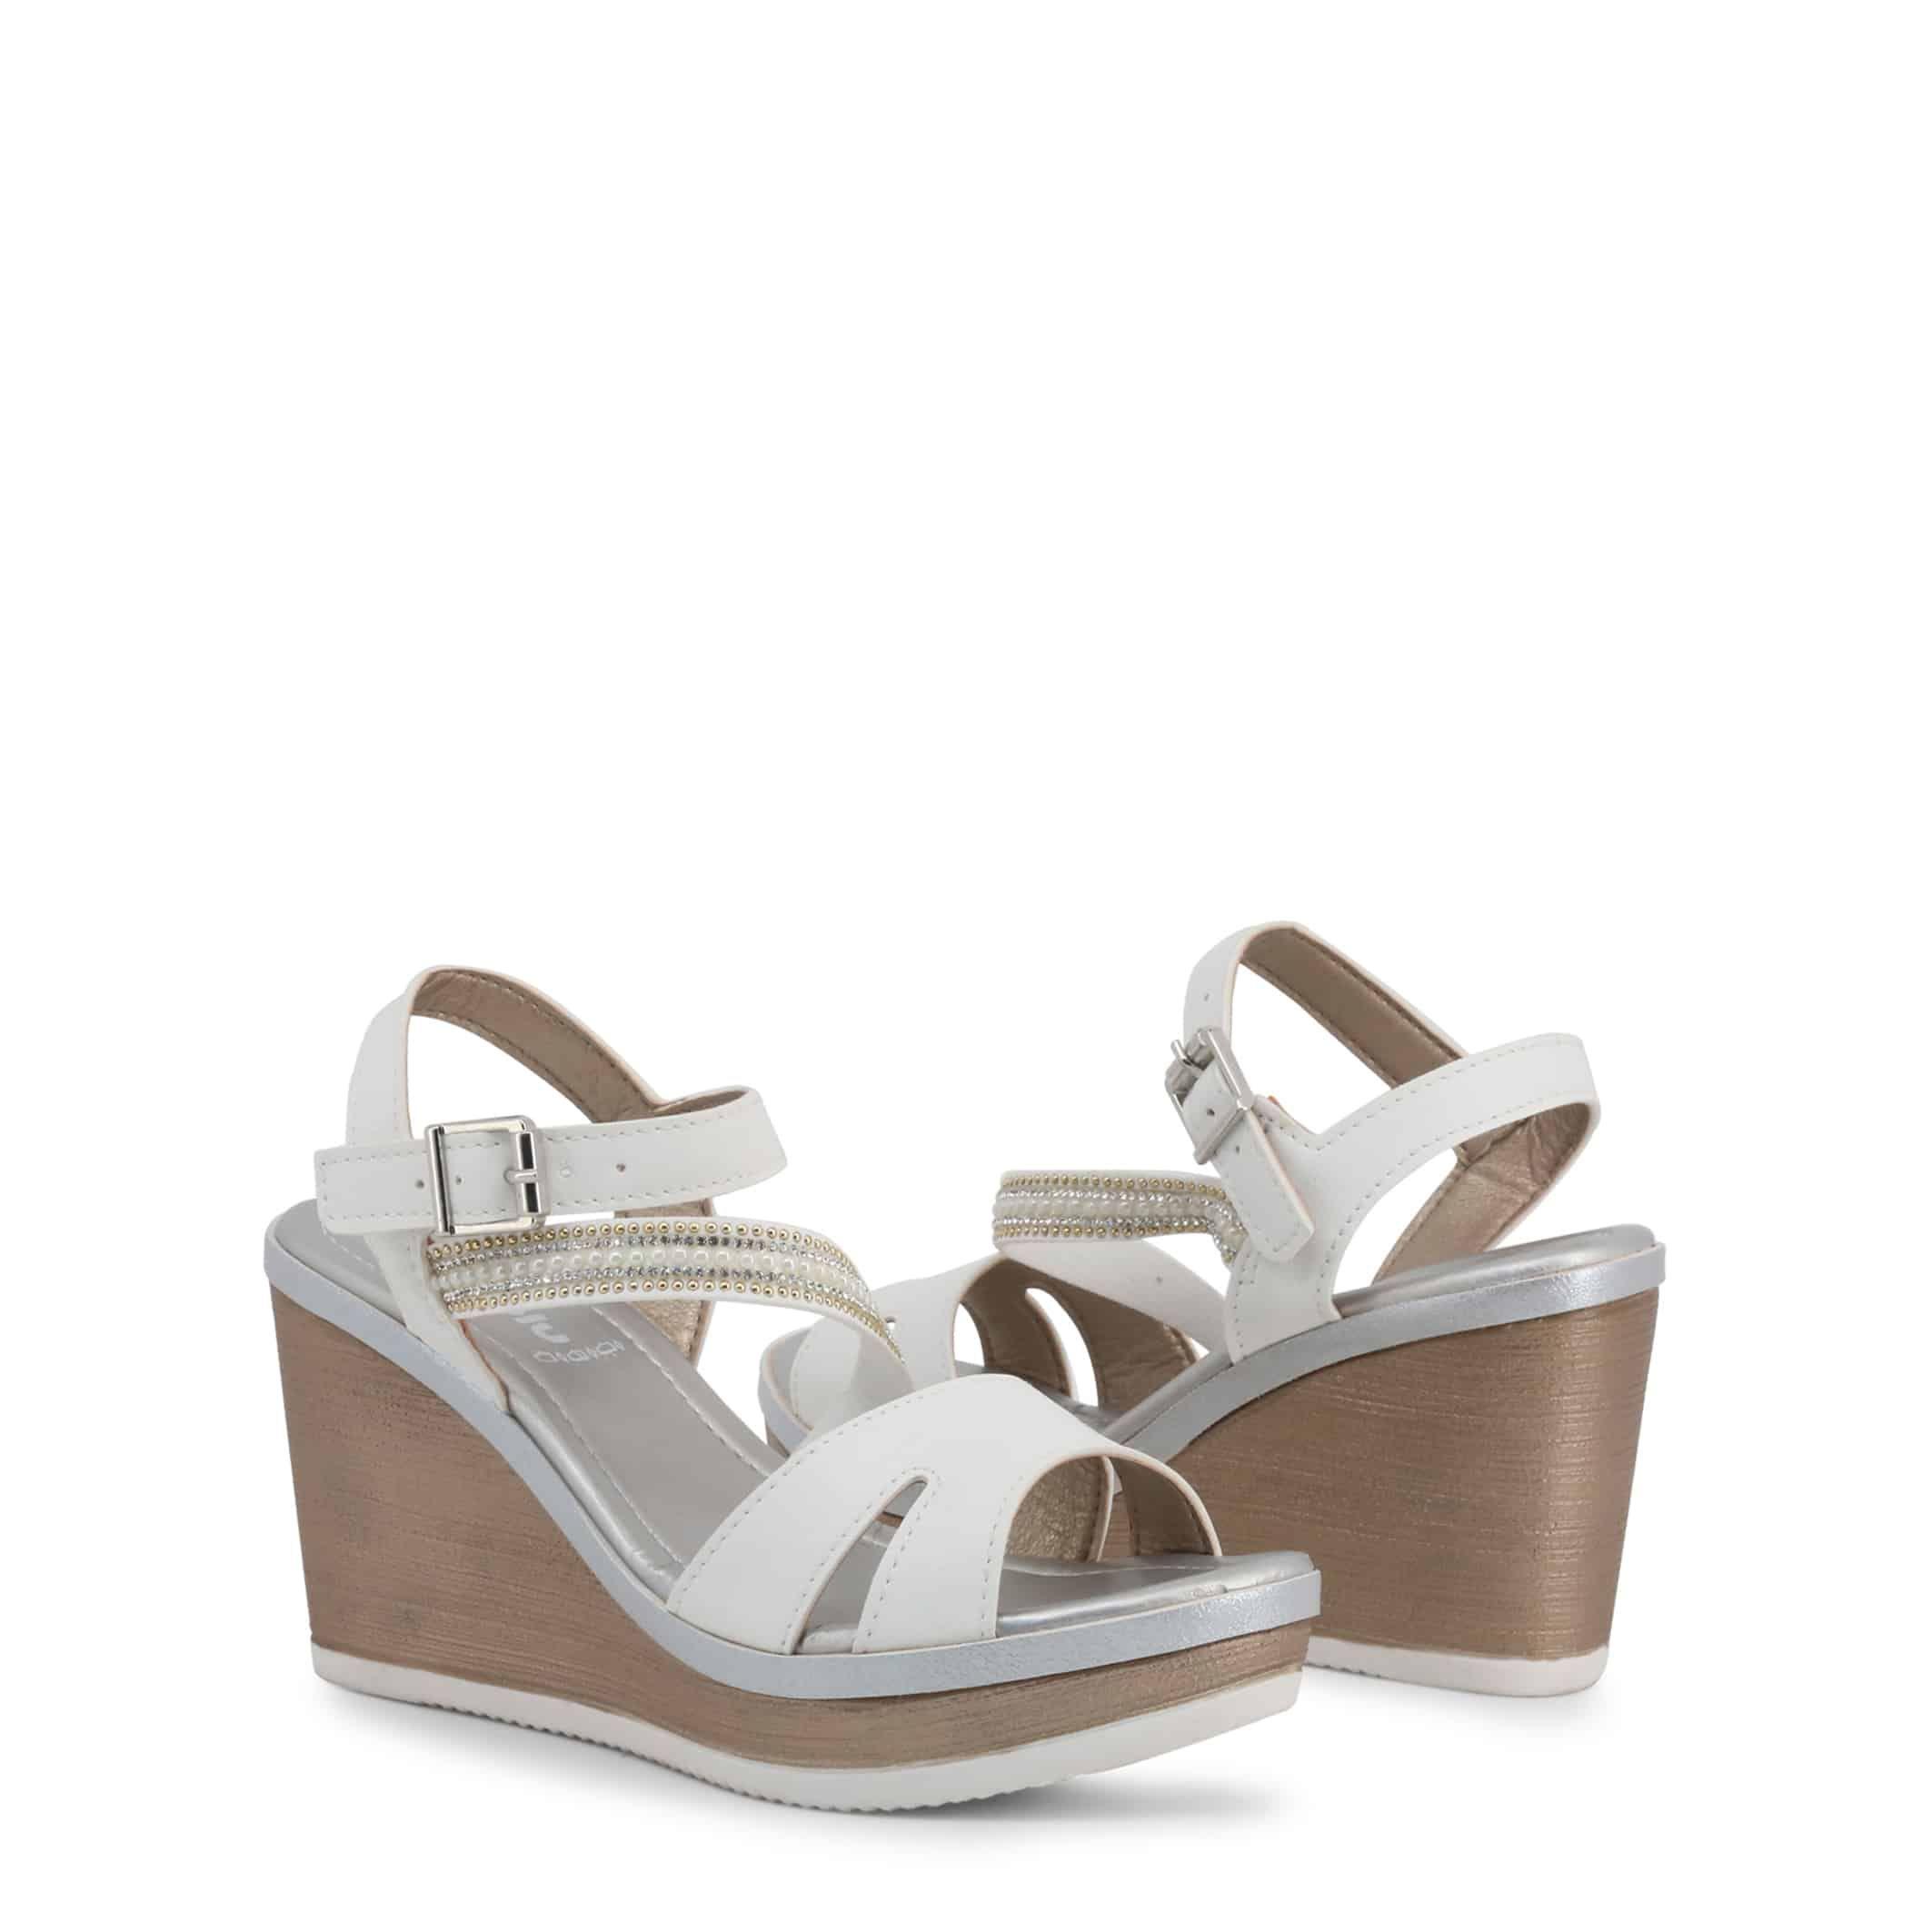 Sandales à plateforme Inblu – IK000009